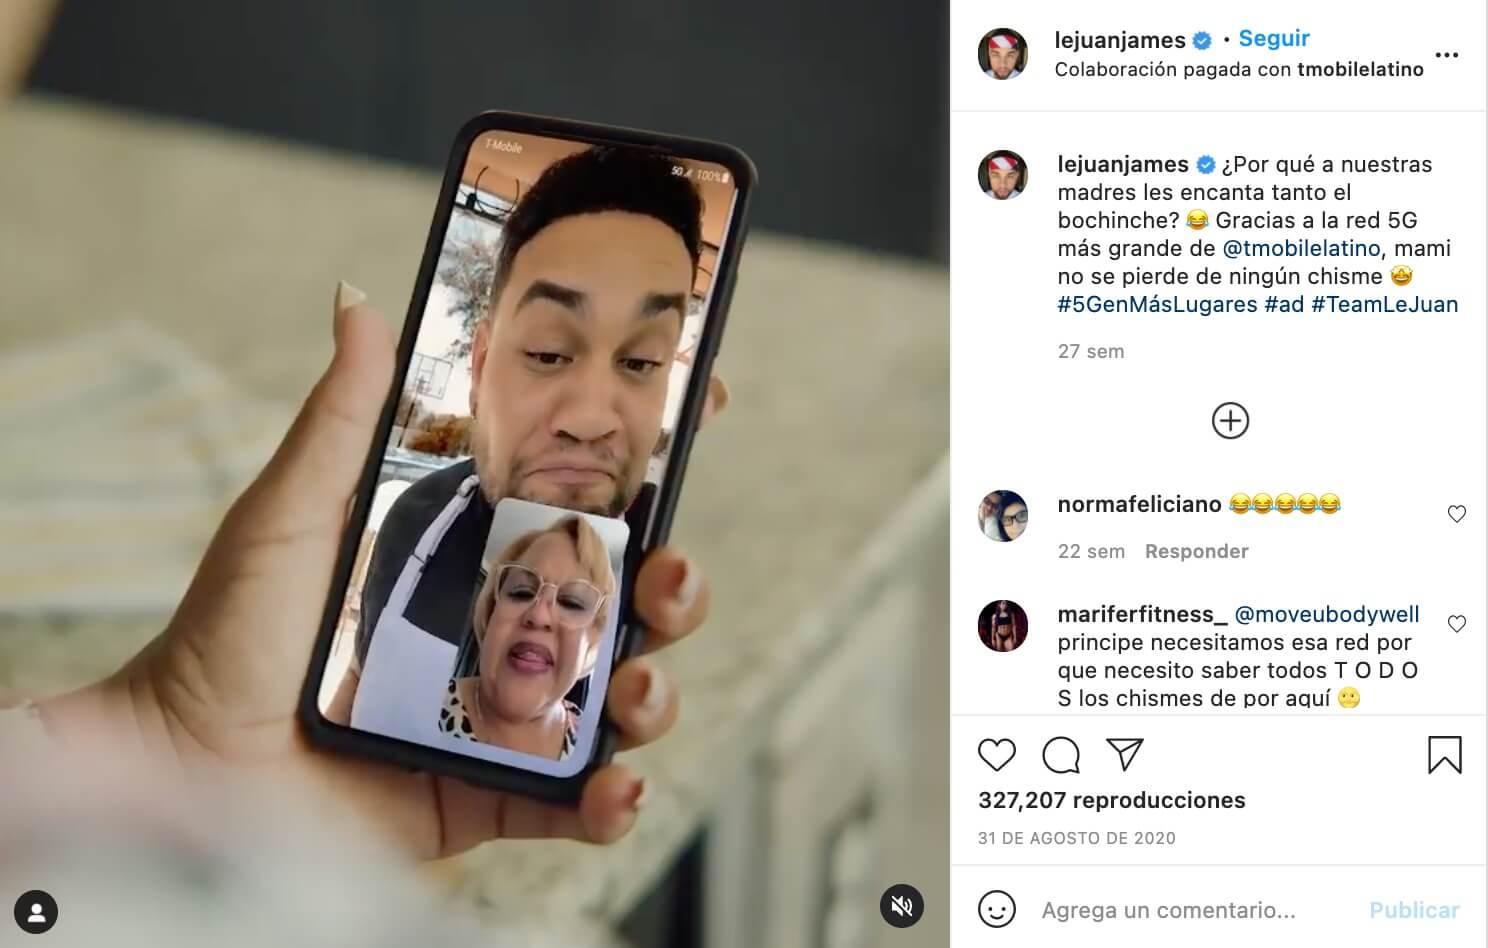 Marketing de influencia ejemplos, T-mobile